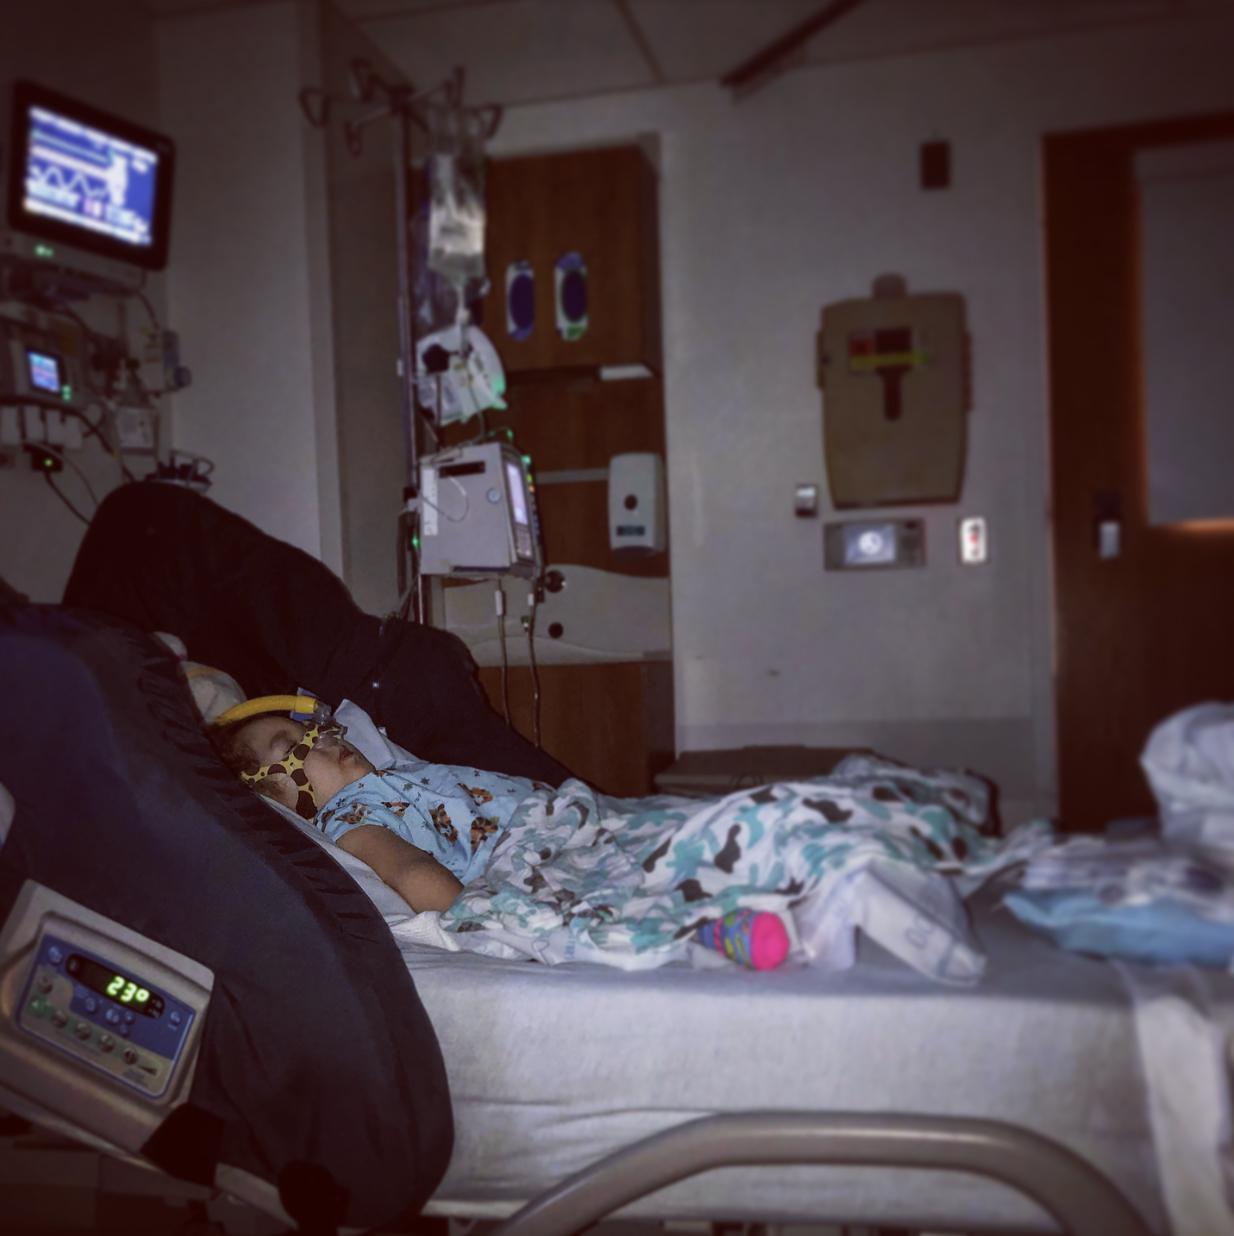 Hospital nights, June 2019